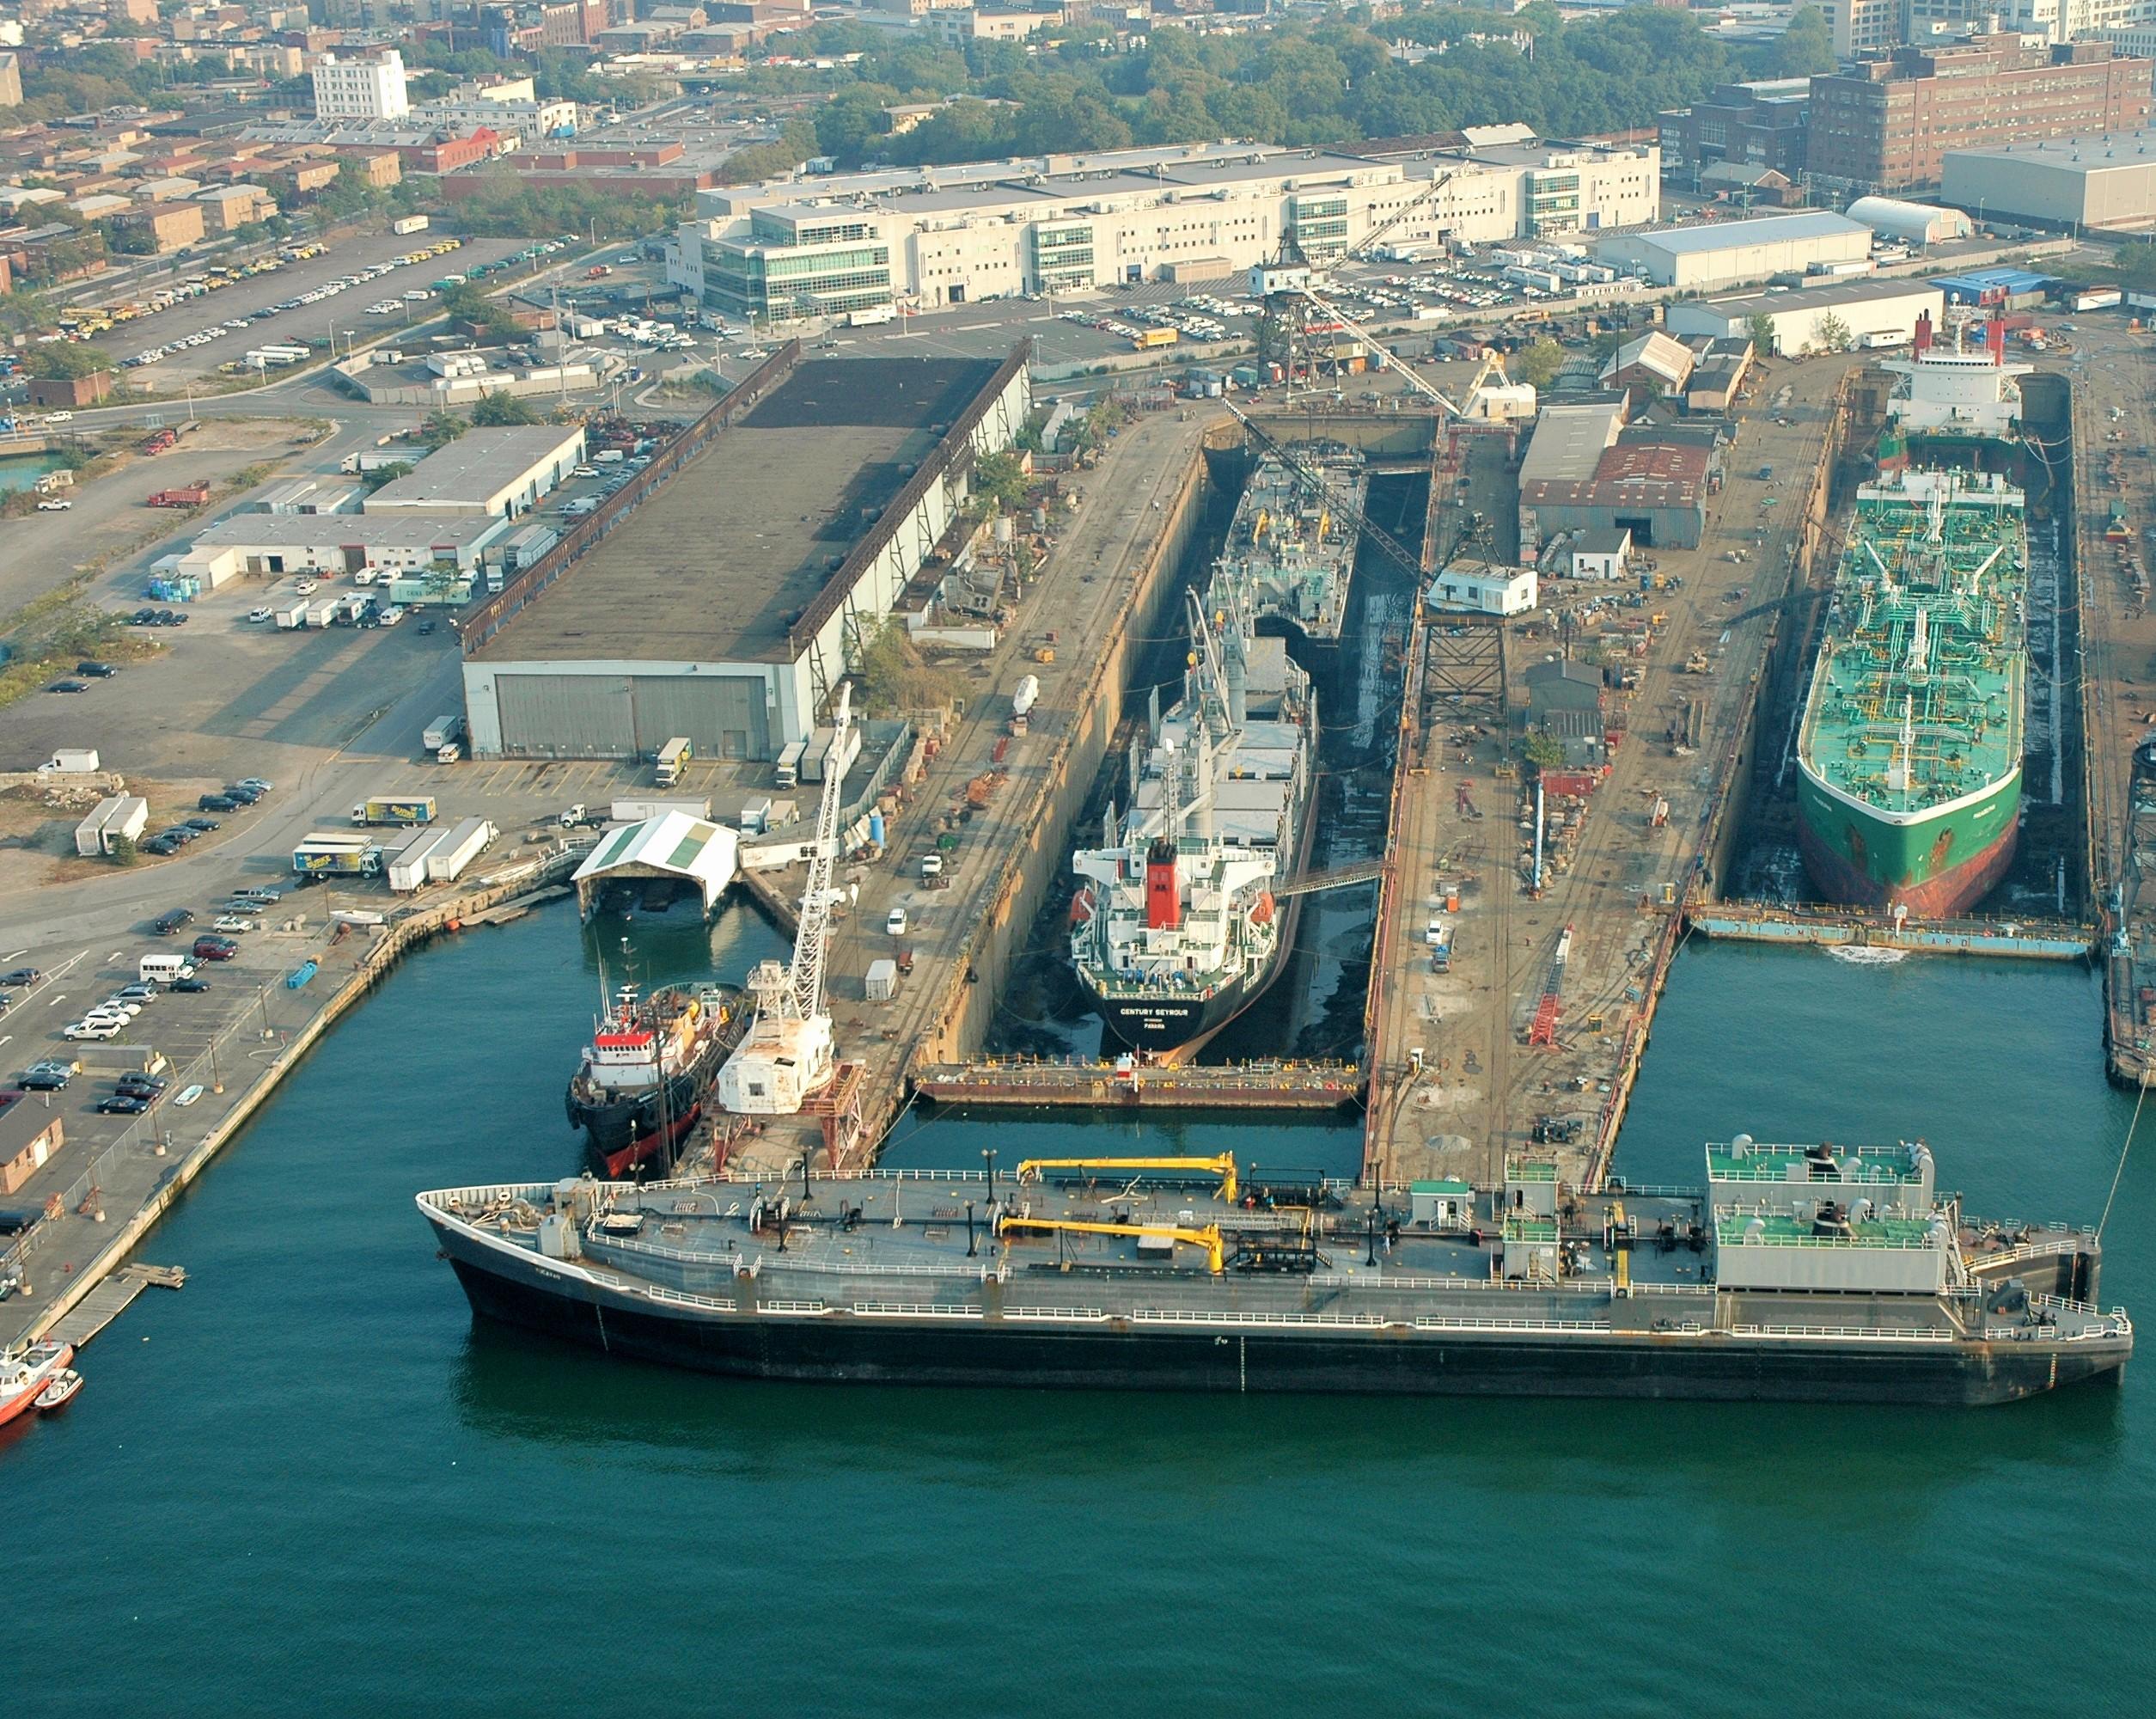 Boston Ship Repair awarded $16.5 million MSC contract